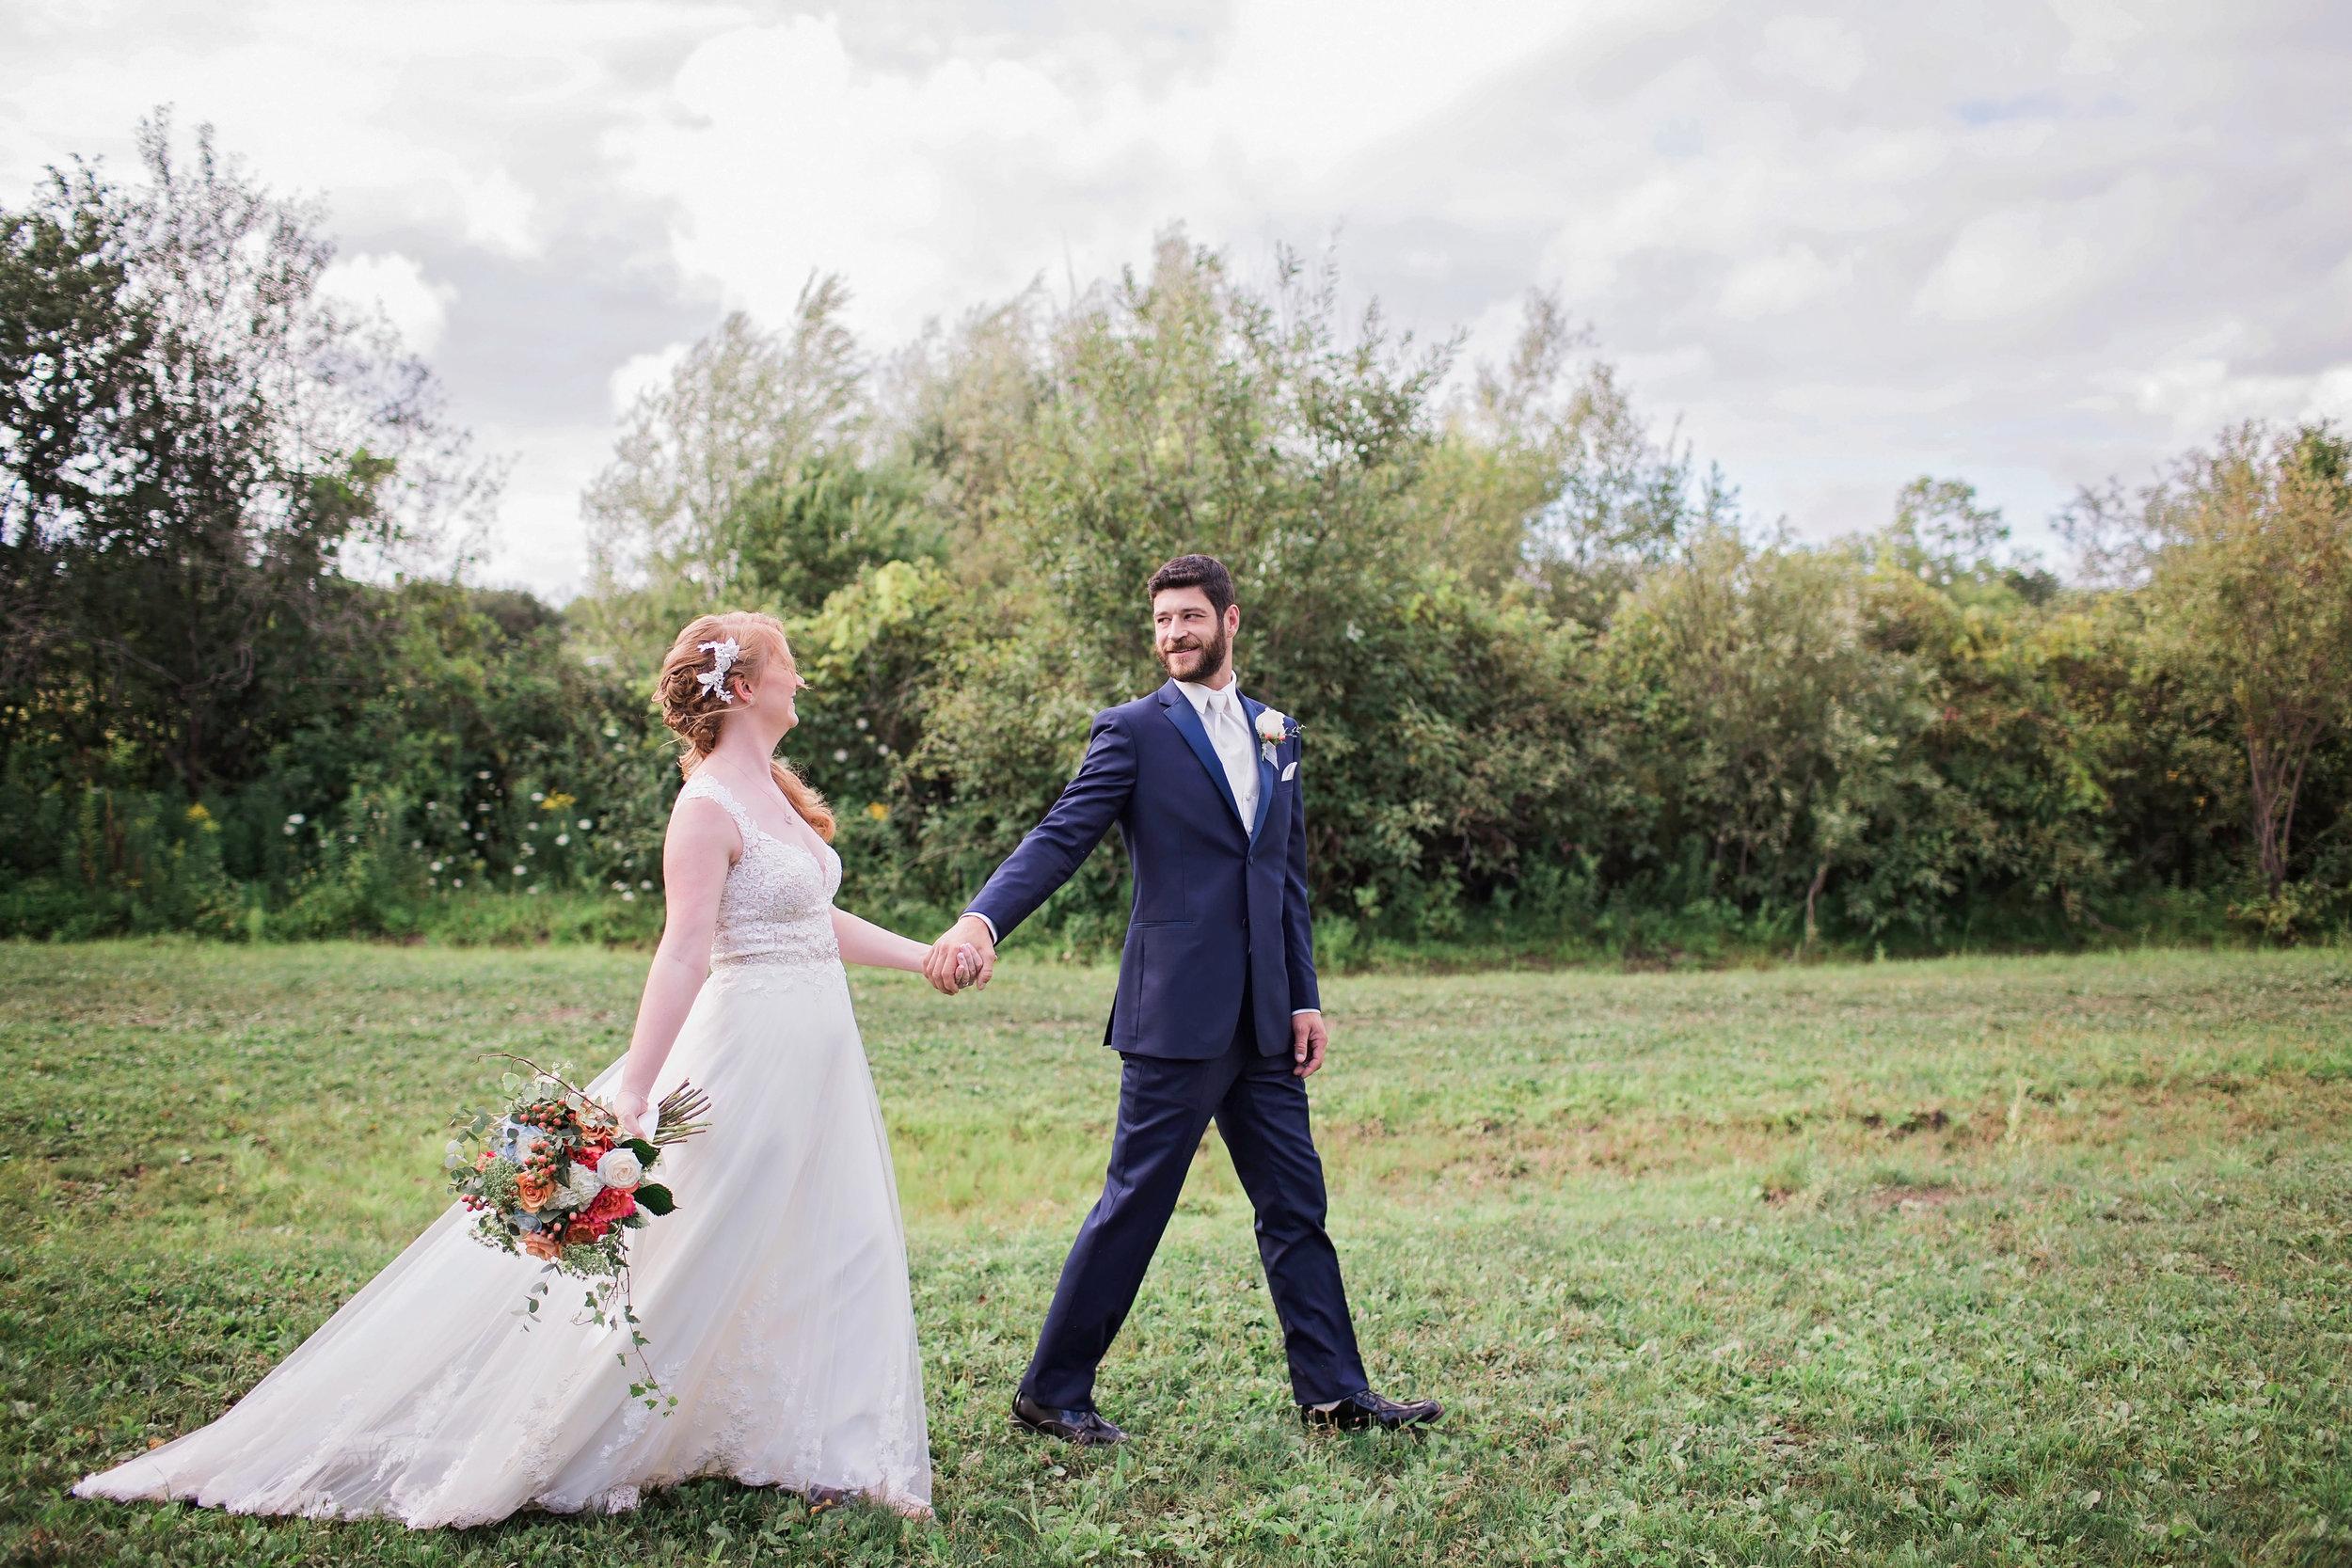 Morgan Bress Photography   Lindsay Wedding Photographer   Kawartha Lakes Wedding Photographer   Ontario Wedding Photographer    Apple Orchard Wedding, Wedding Love, Romance, Light and Airy